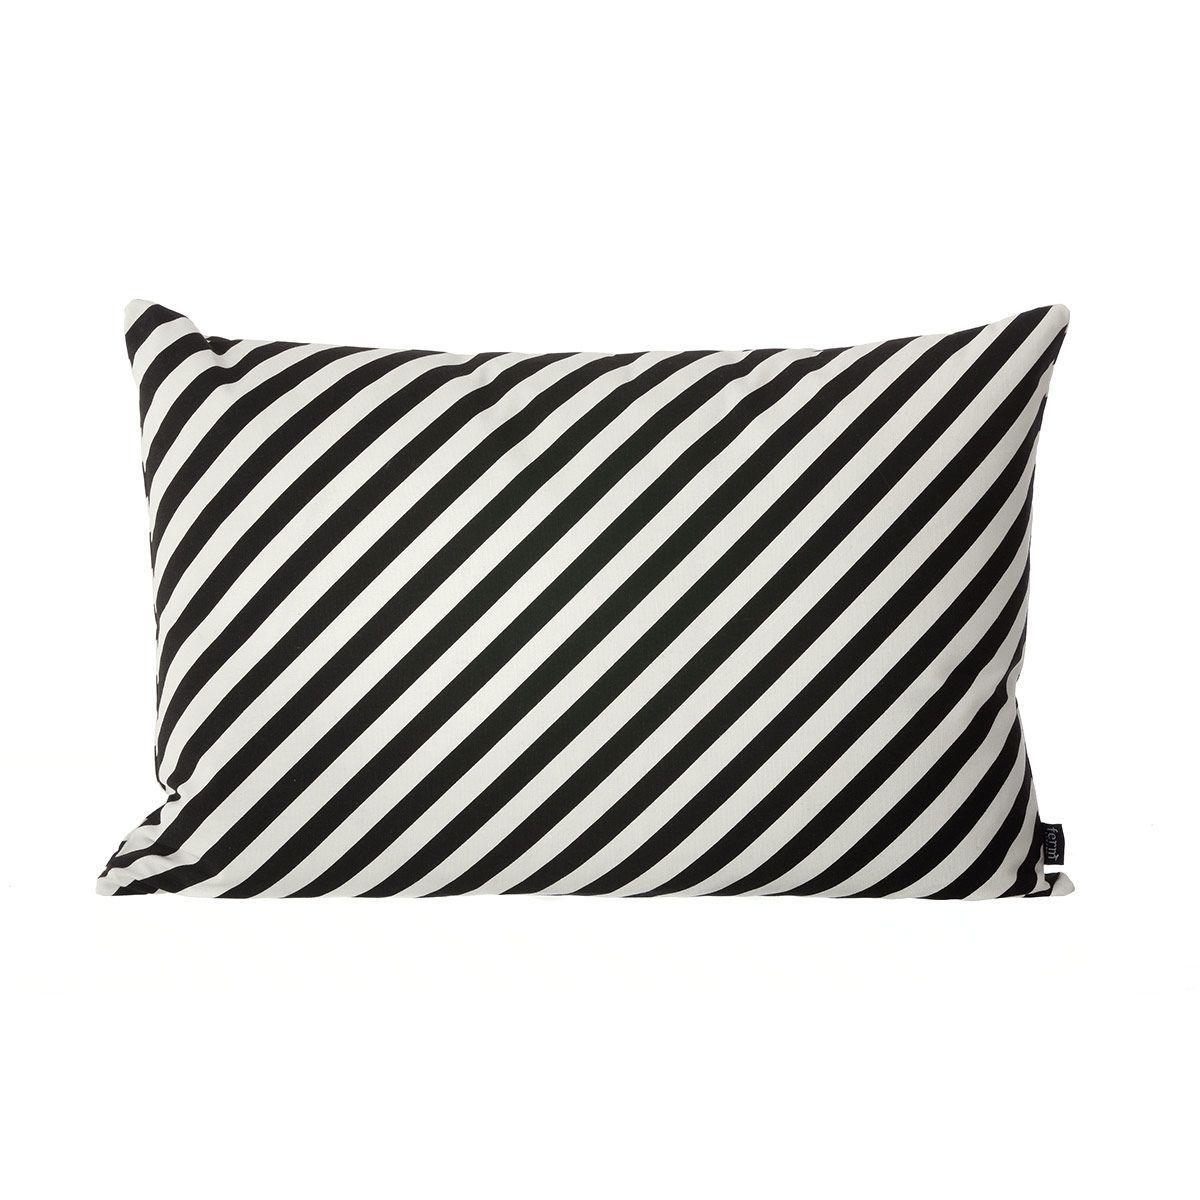 Ferm Living Kissen Black Stripe 60cm x 40cm